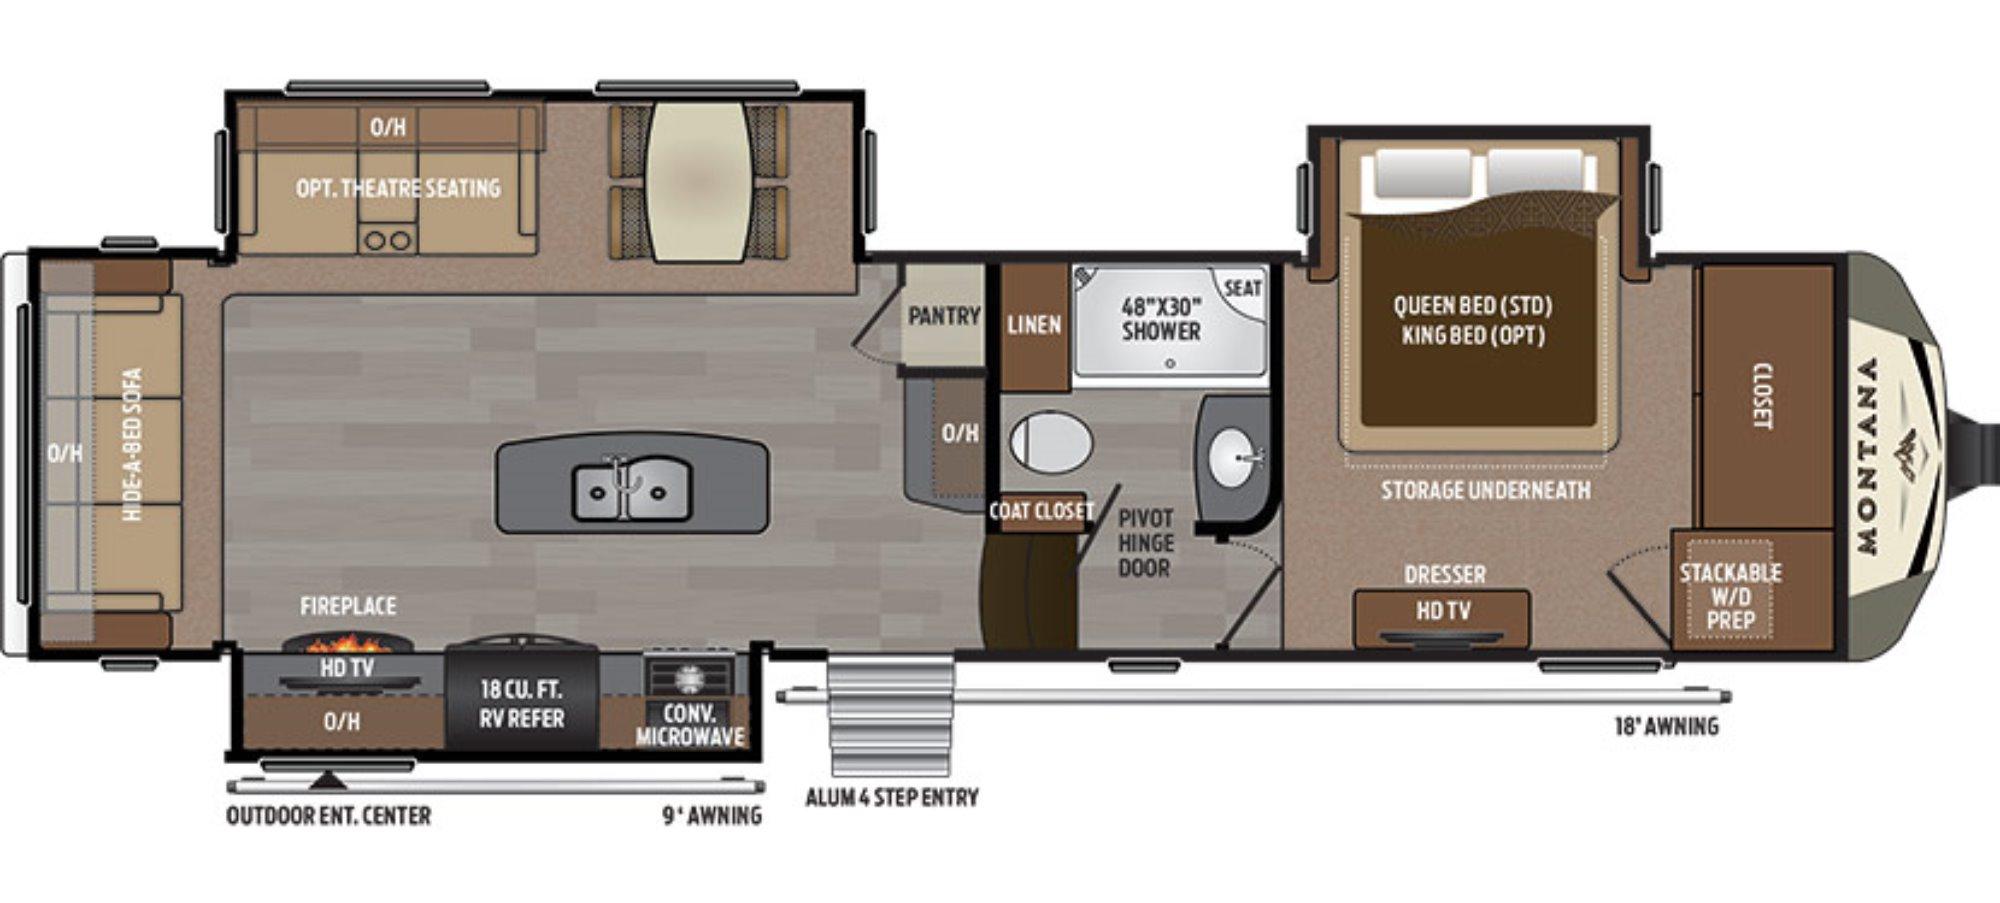 New 2017 keystone montana 3160rl fifth wheel for sale 1326240 for Montana floor plans